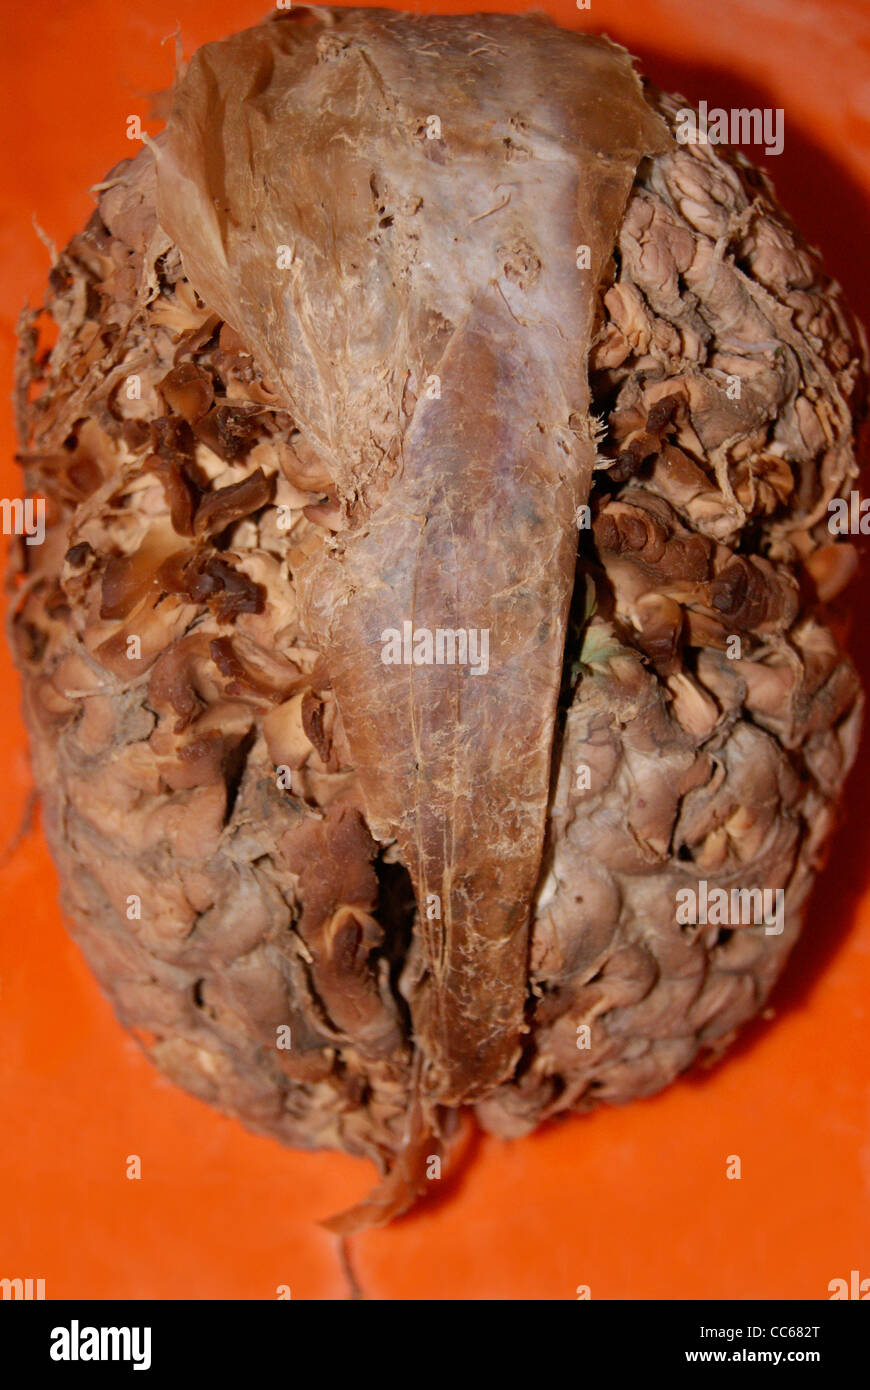 Original Human Brain ( Preserved from Hospital ) - Stock Image